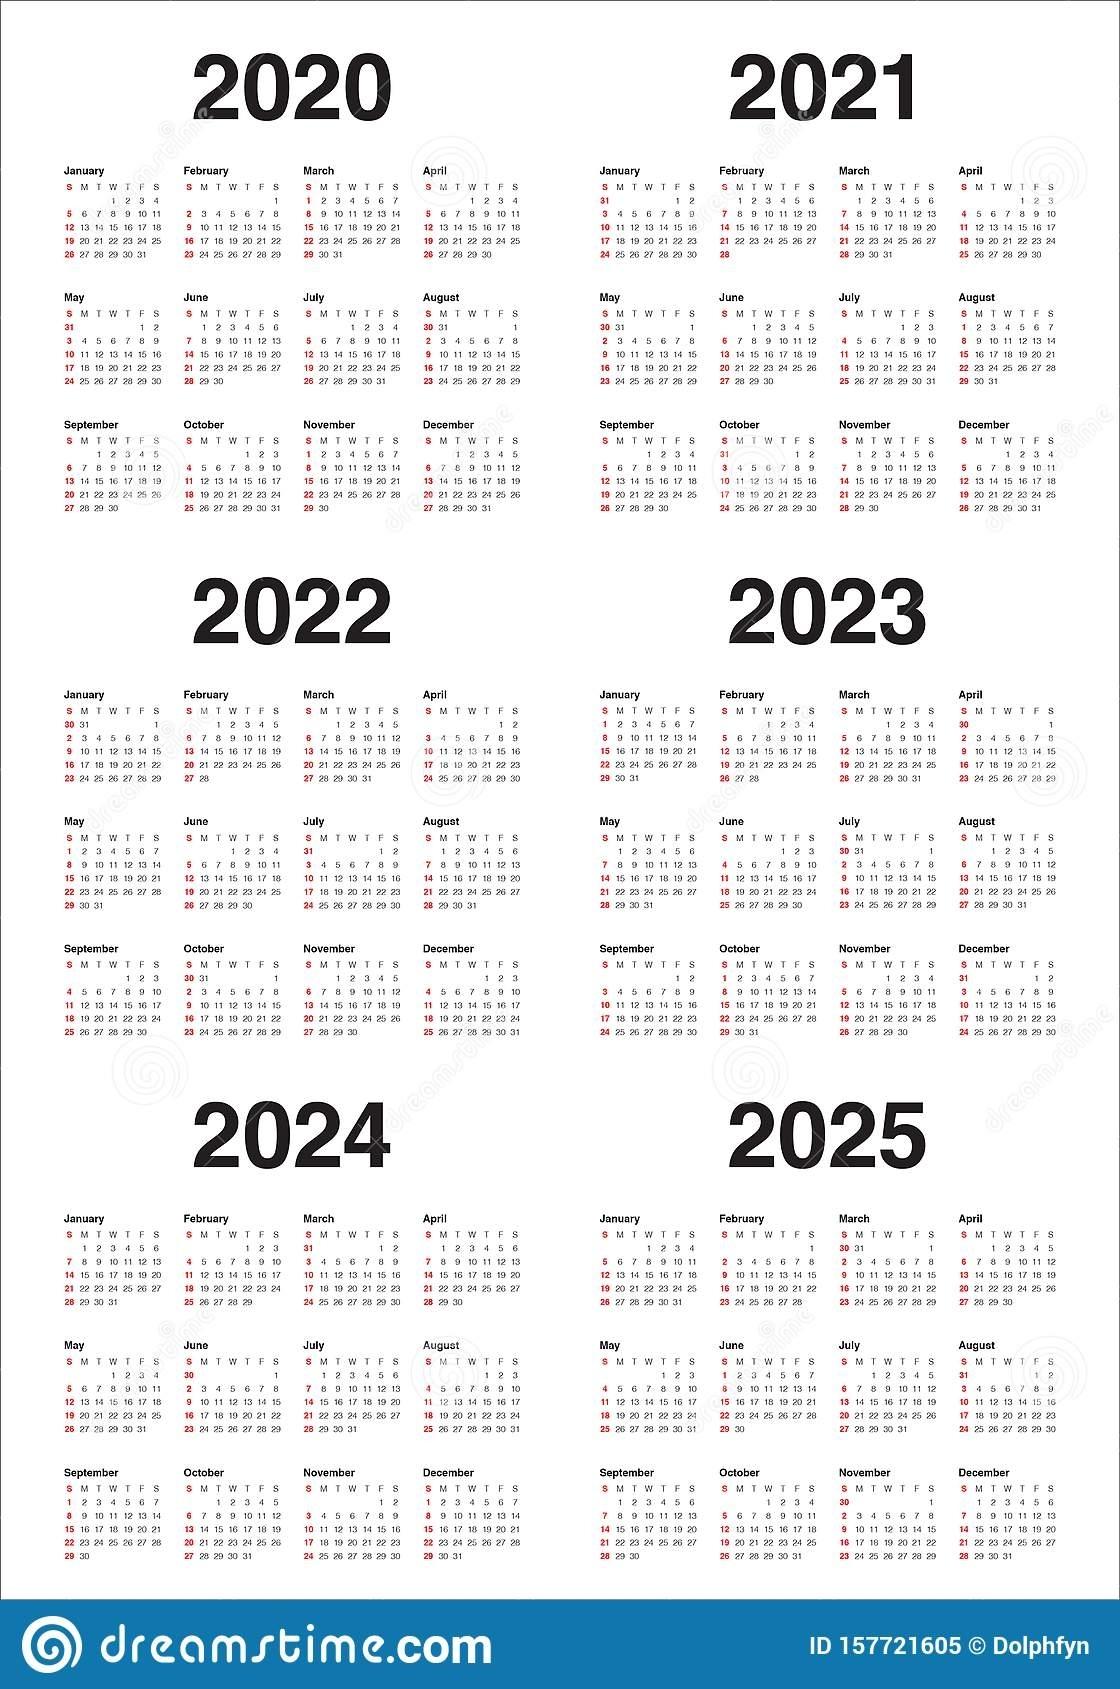 Printable 3 Year Calendars 2021 2022 2023 | Ten Free